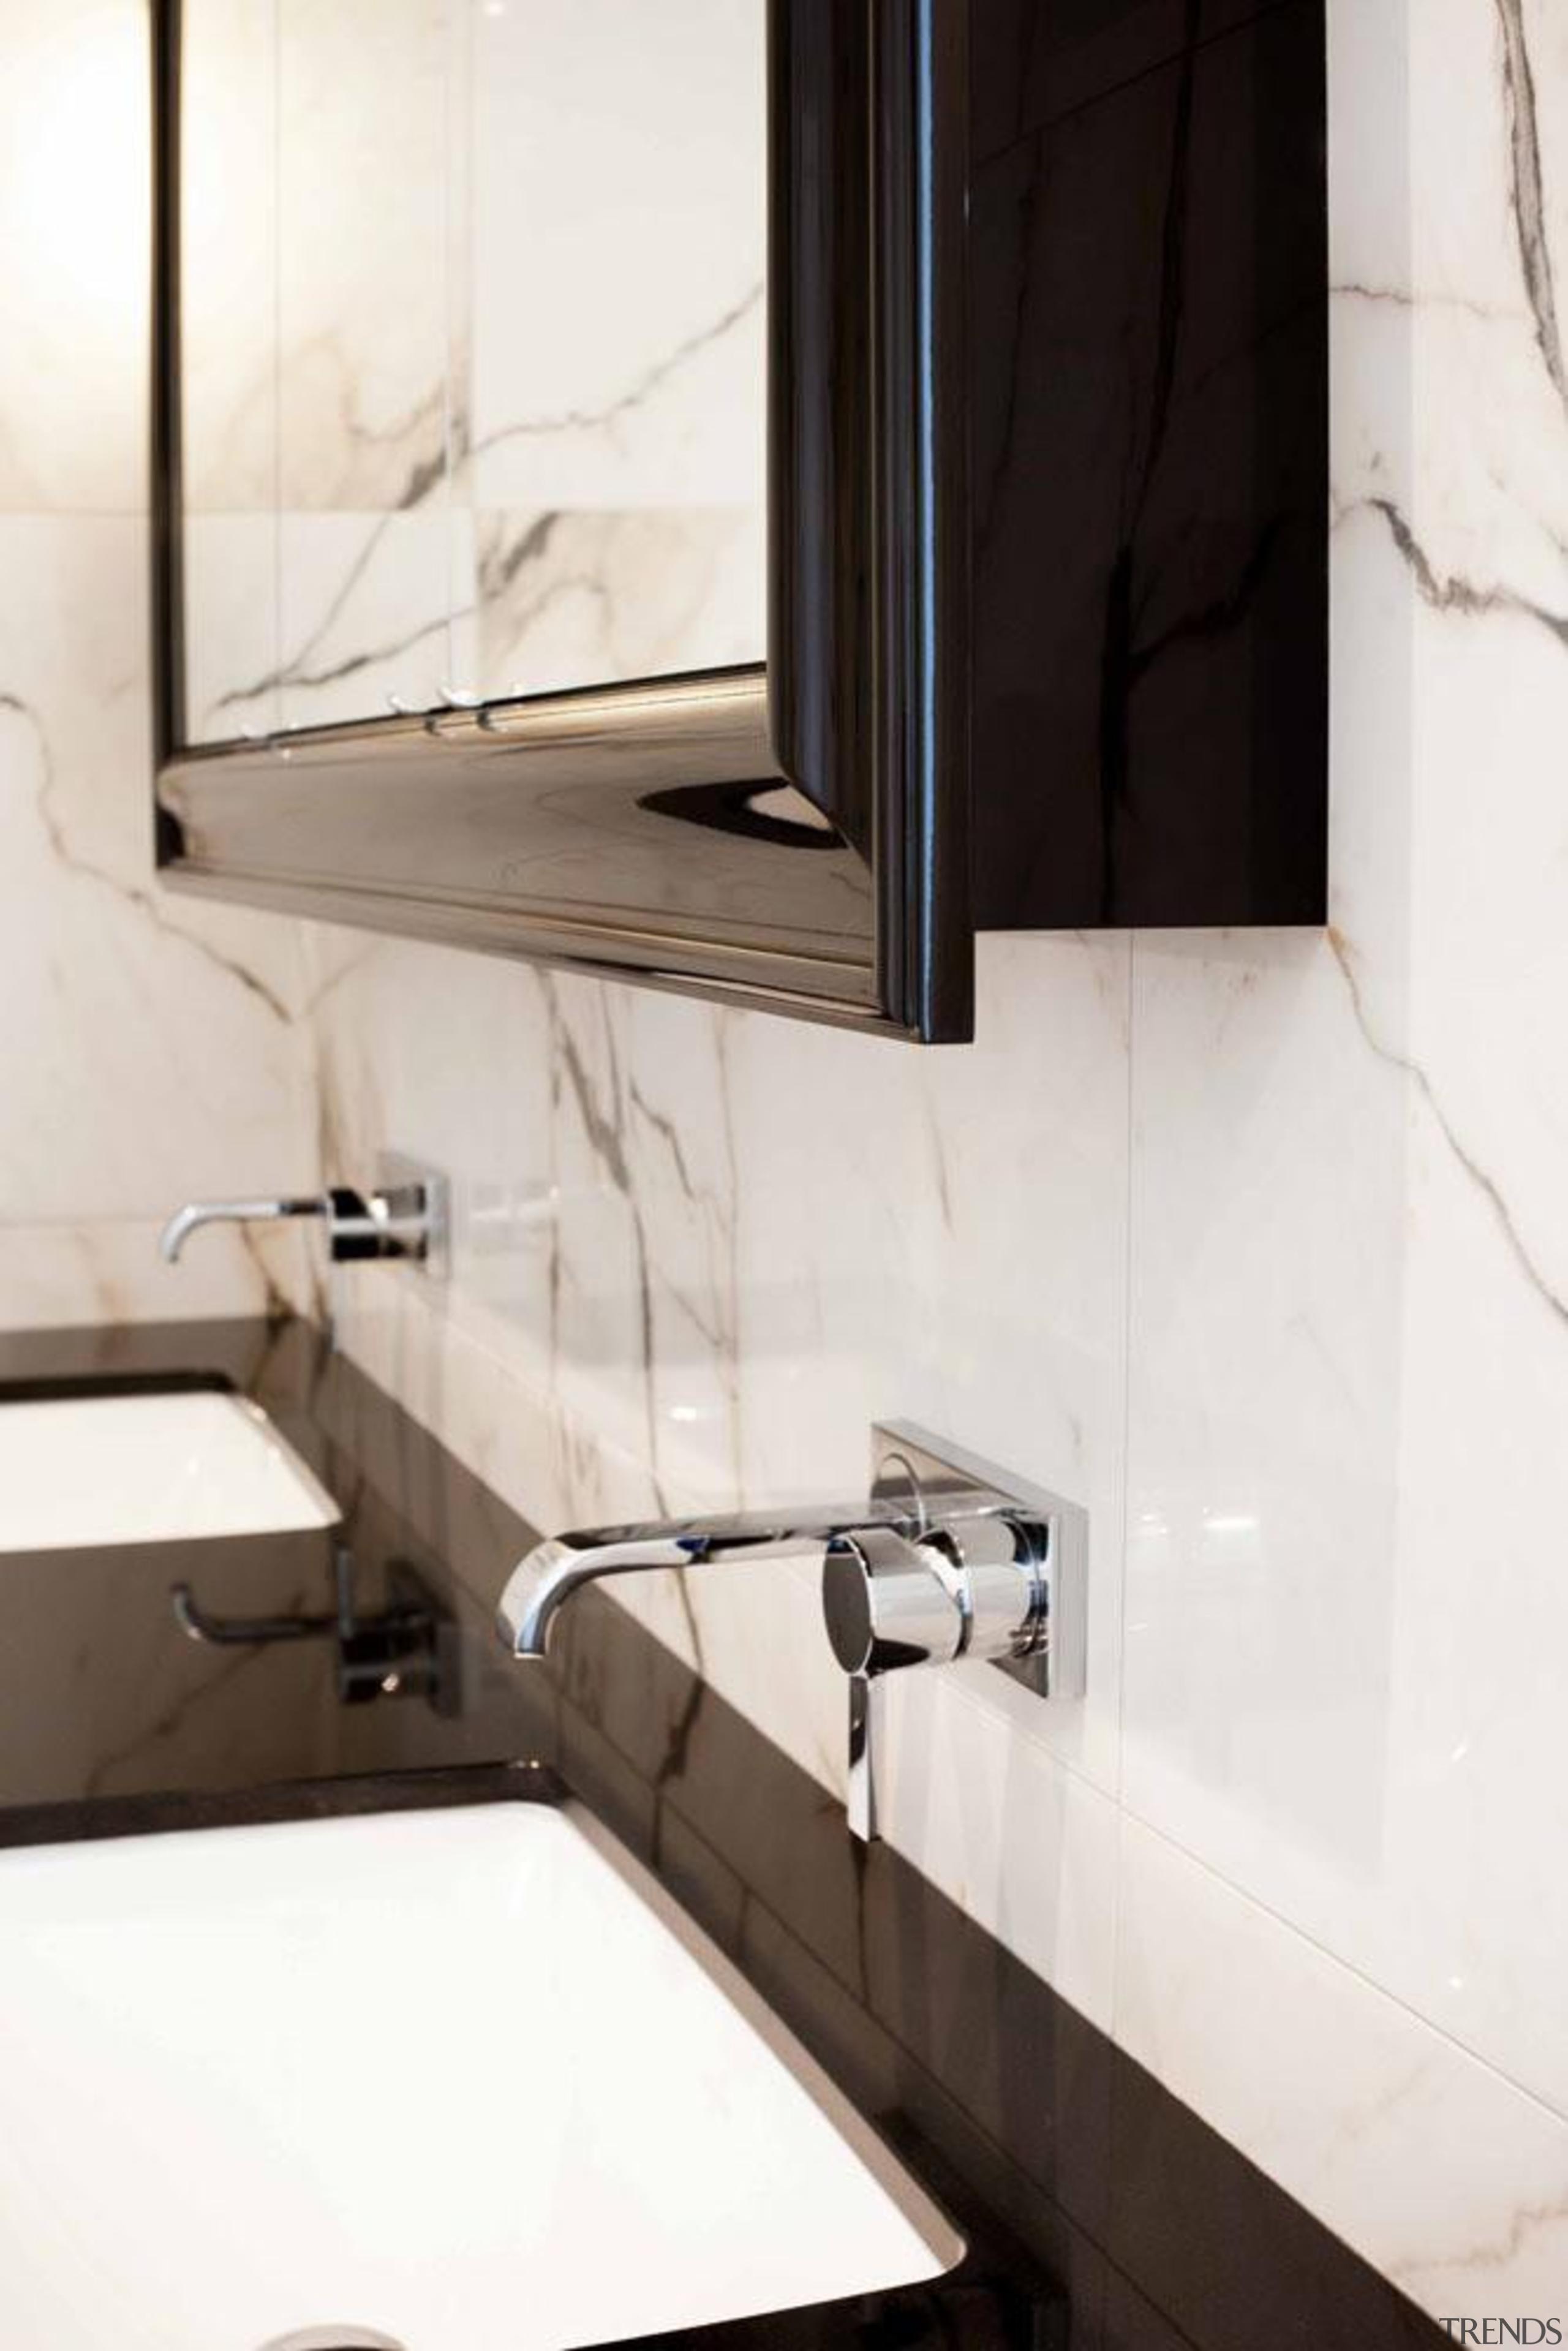 2.jpg - bathroom   floor   interior design bathroom, floor, interior design, plumbing fixture, room, sink, tap, tile, white